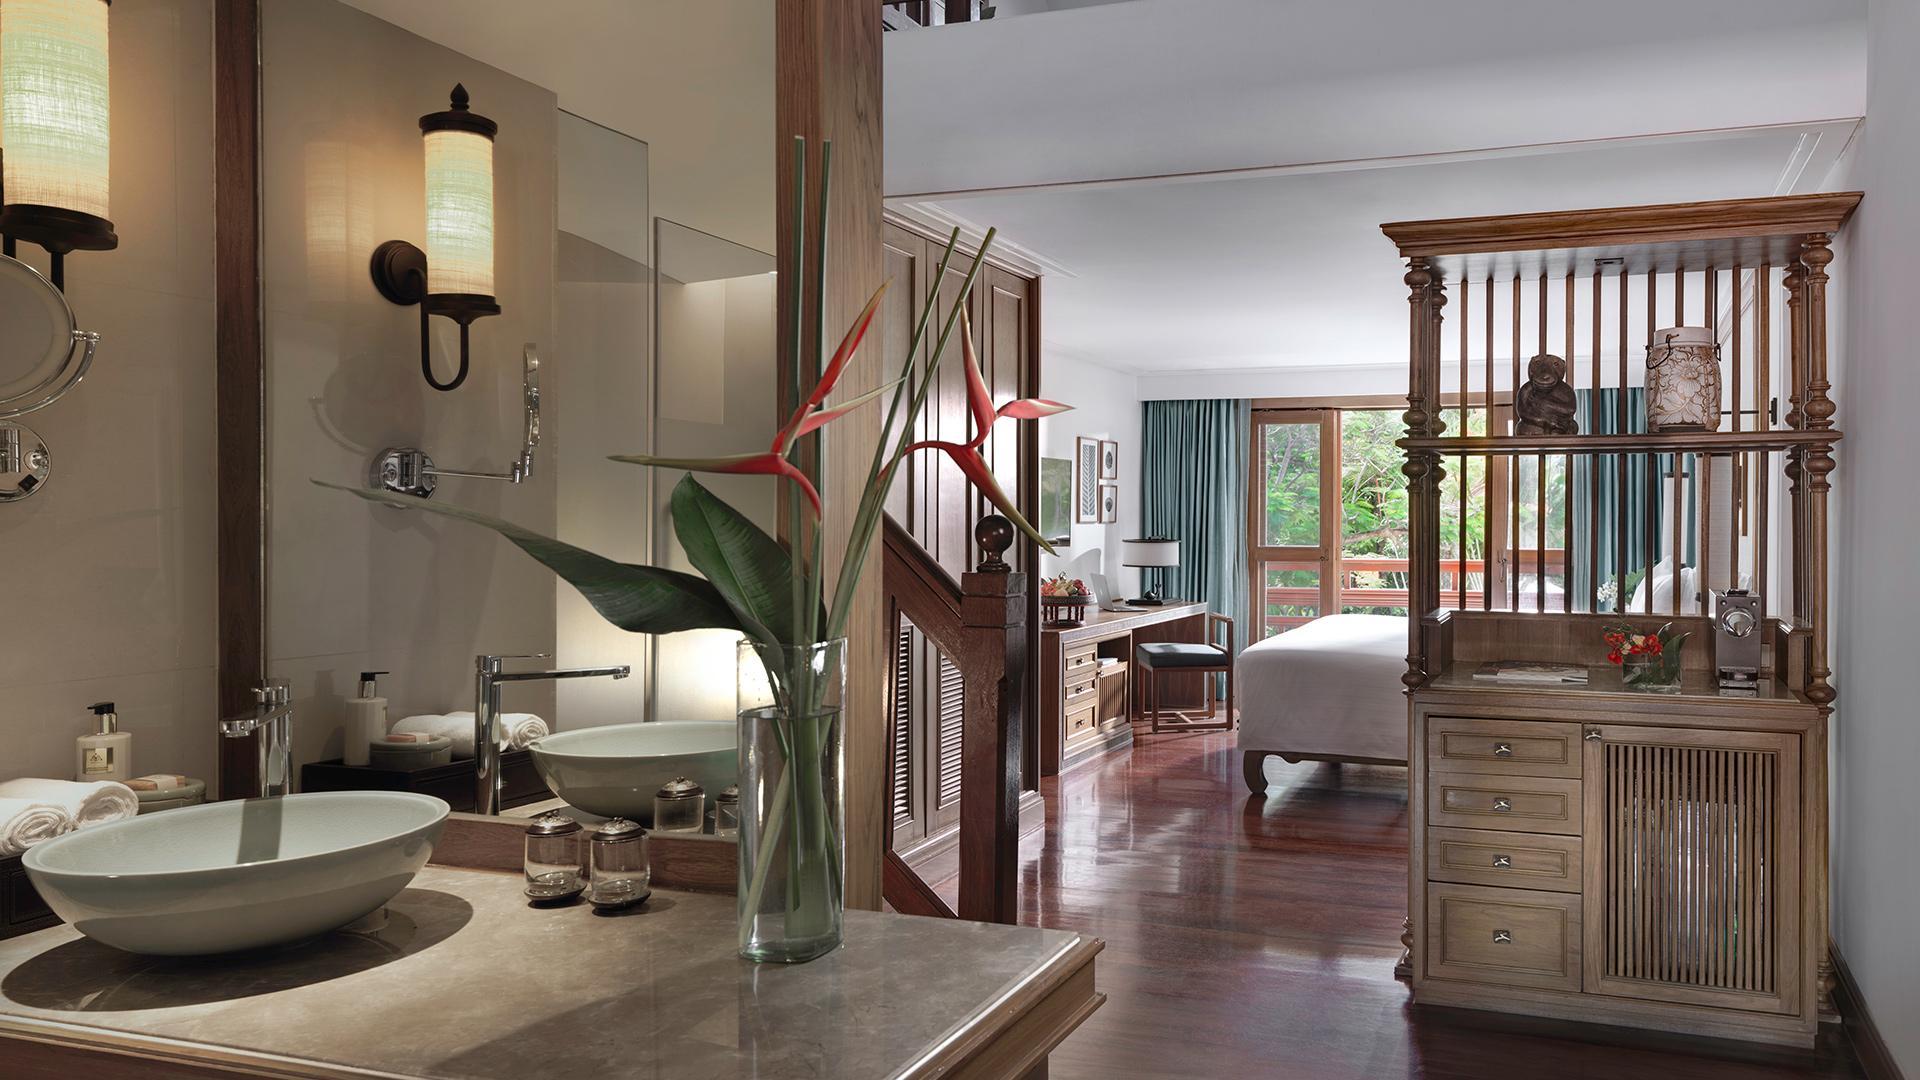 Duplex One-Bedroom Suite image 1 at Santiburi Koh Samui by Amphoe Ko Samui, Surat Thani, Thailand